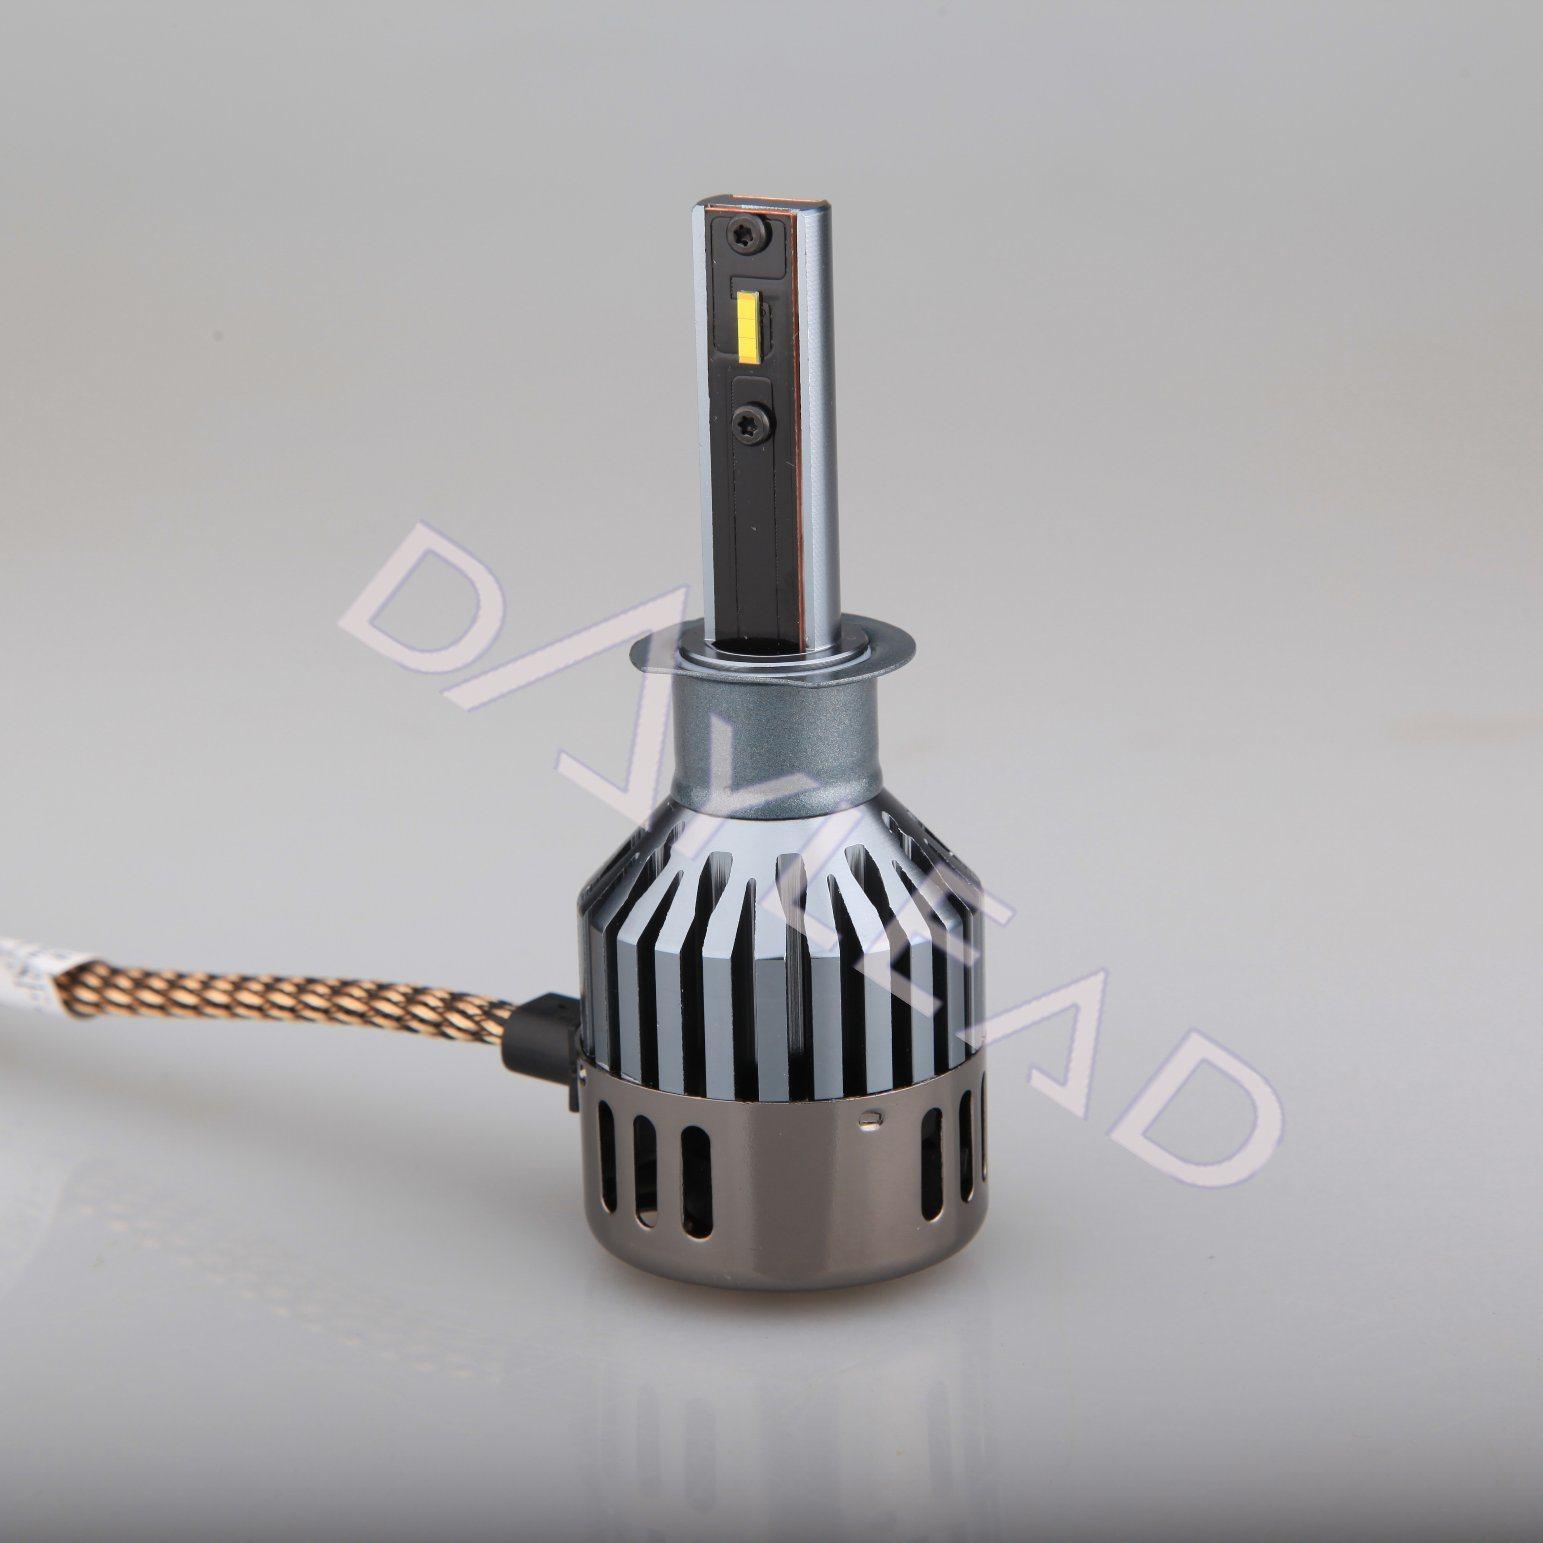 6000k High Quality Portable LED Car Light